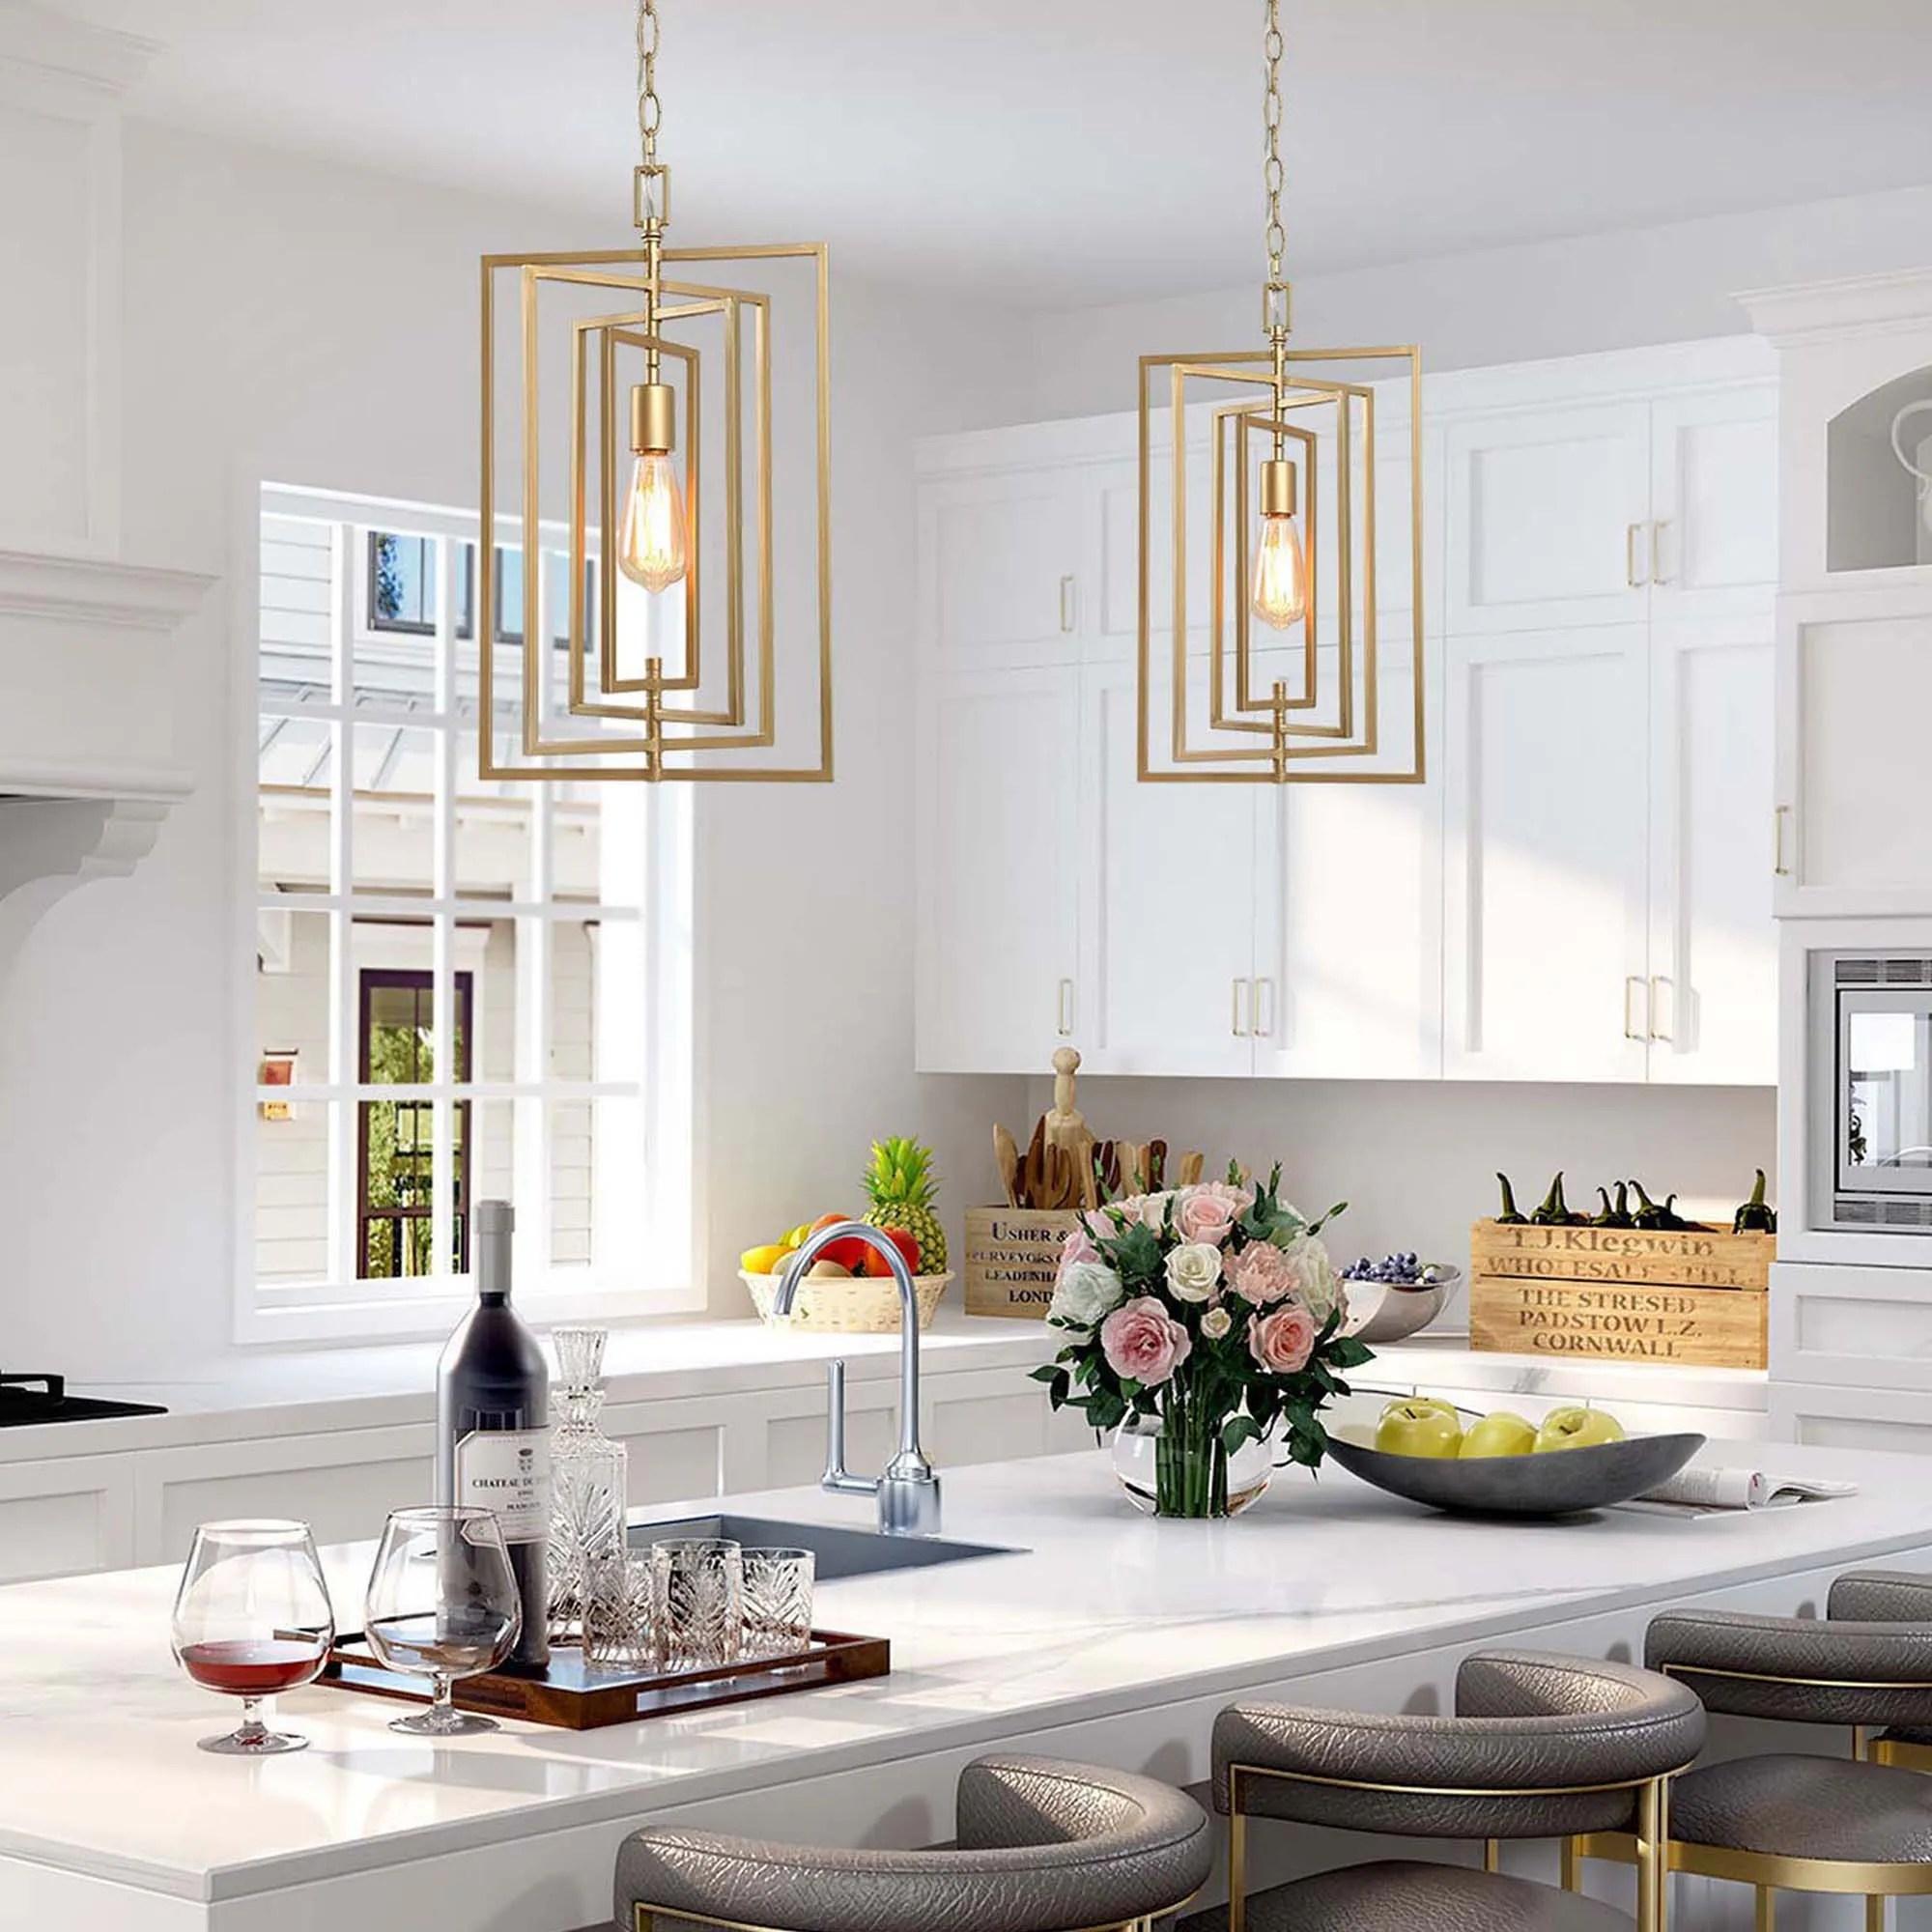 glam ceiling hanging light gold black pendant lighting for kitchen island